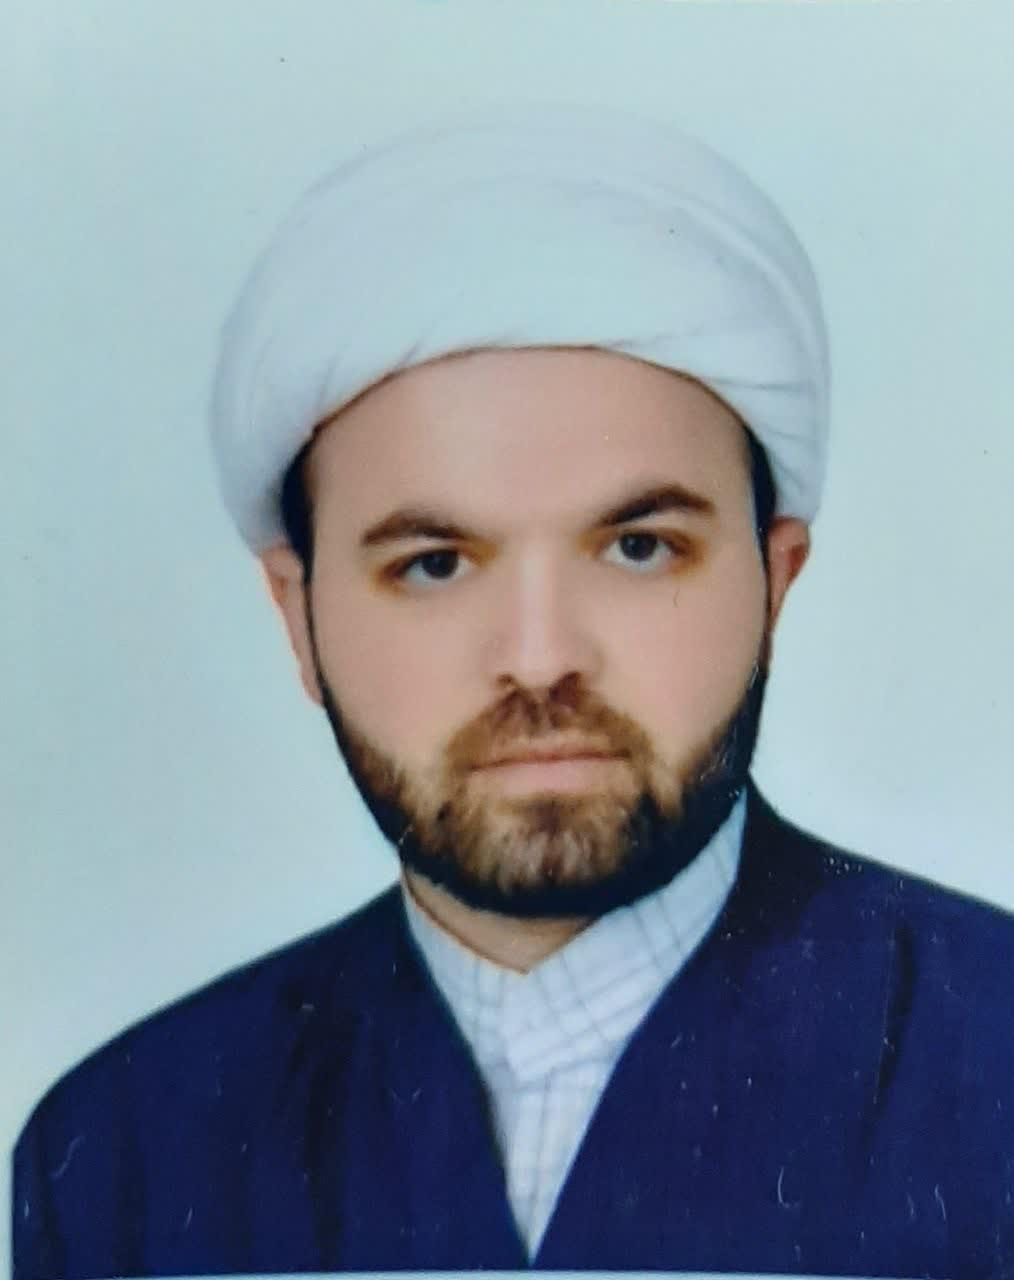 زندگینامه حجت الاسلام والمسلمین مهدی خان محمدی